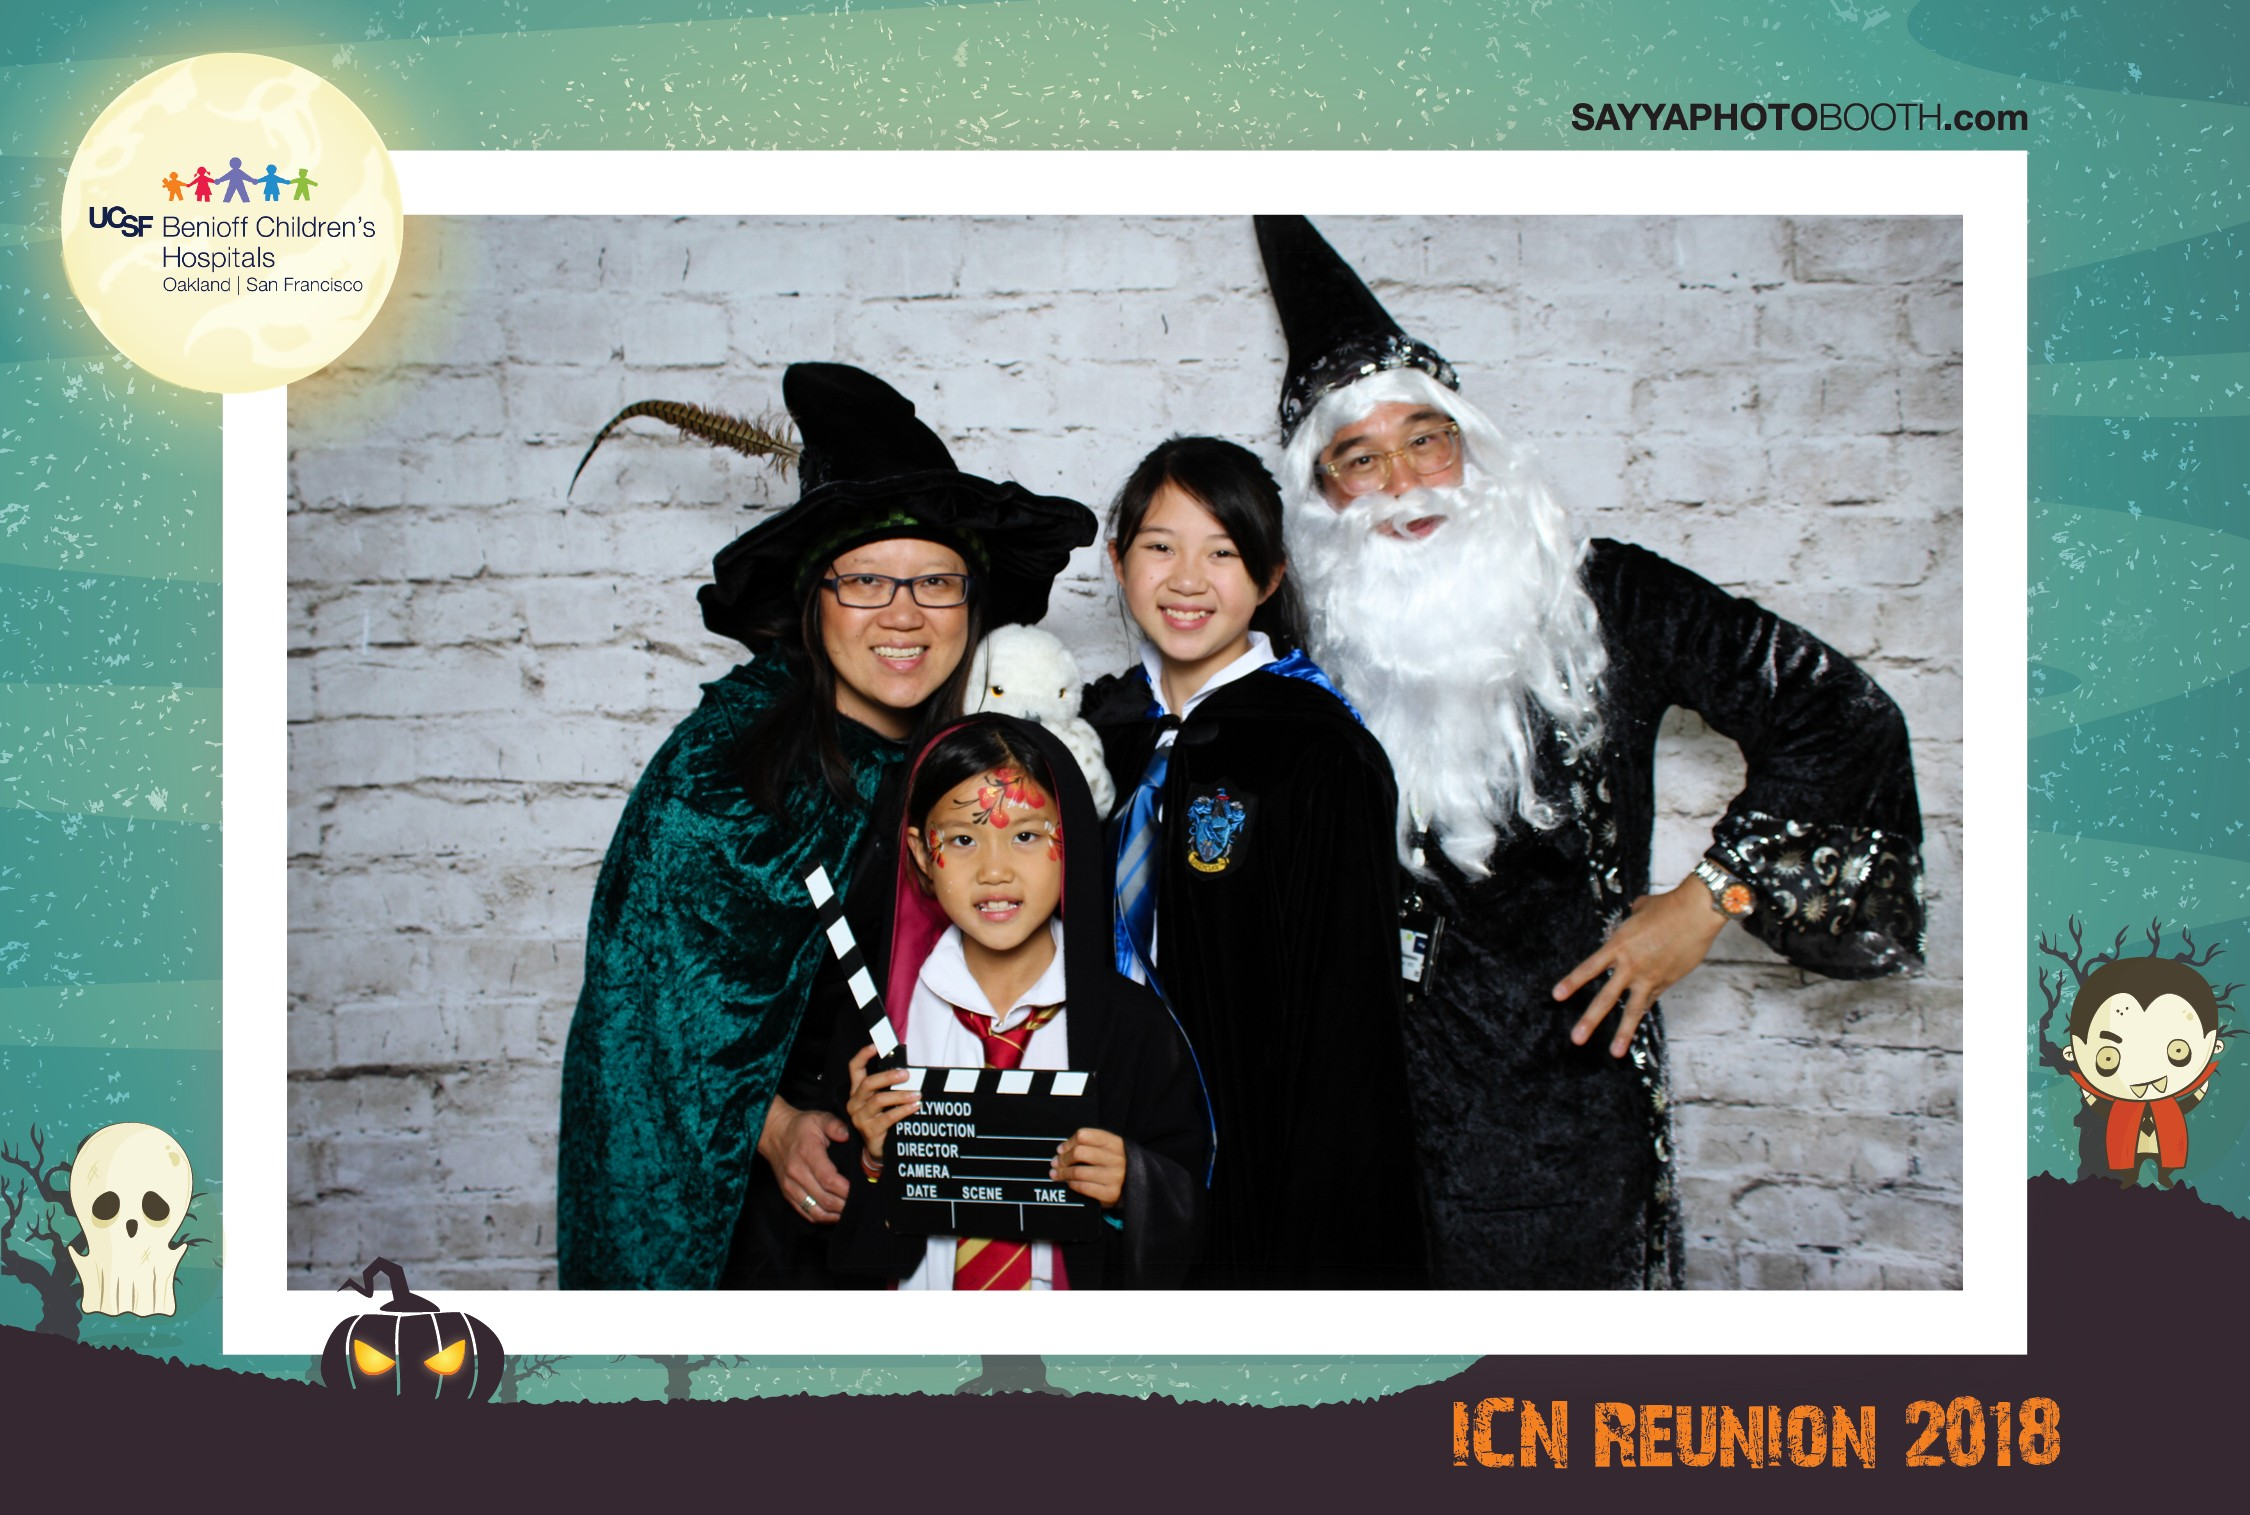 UCSF ICN Reunion